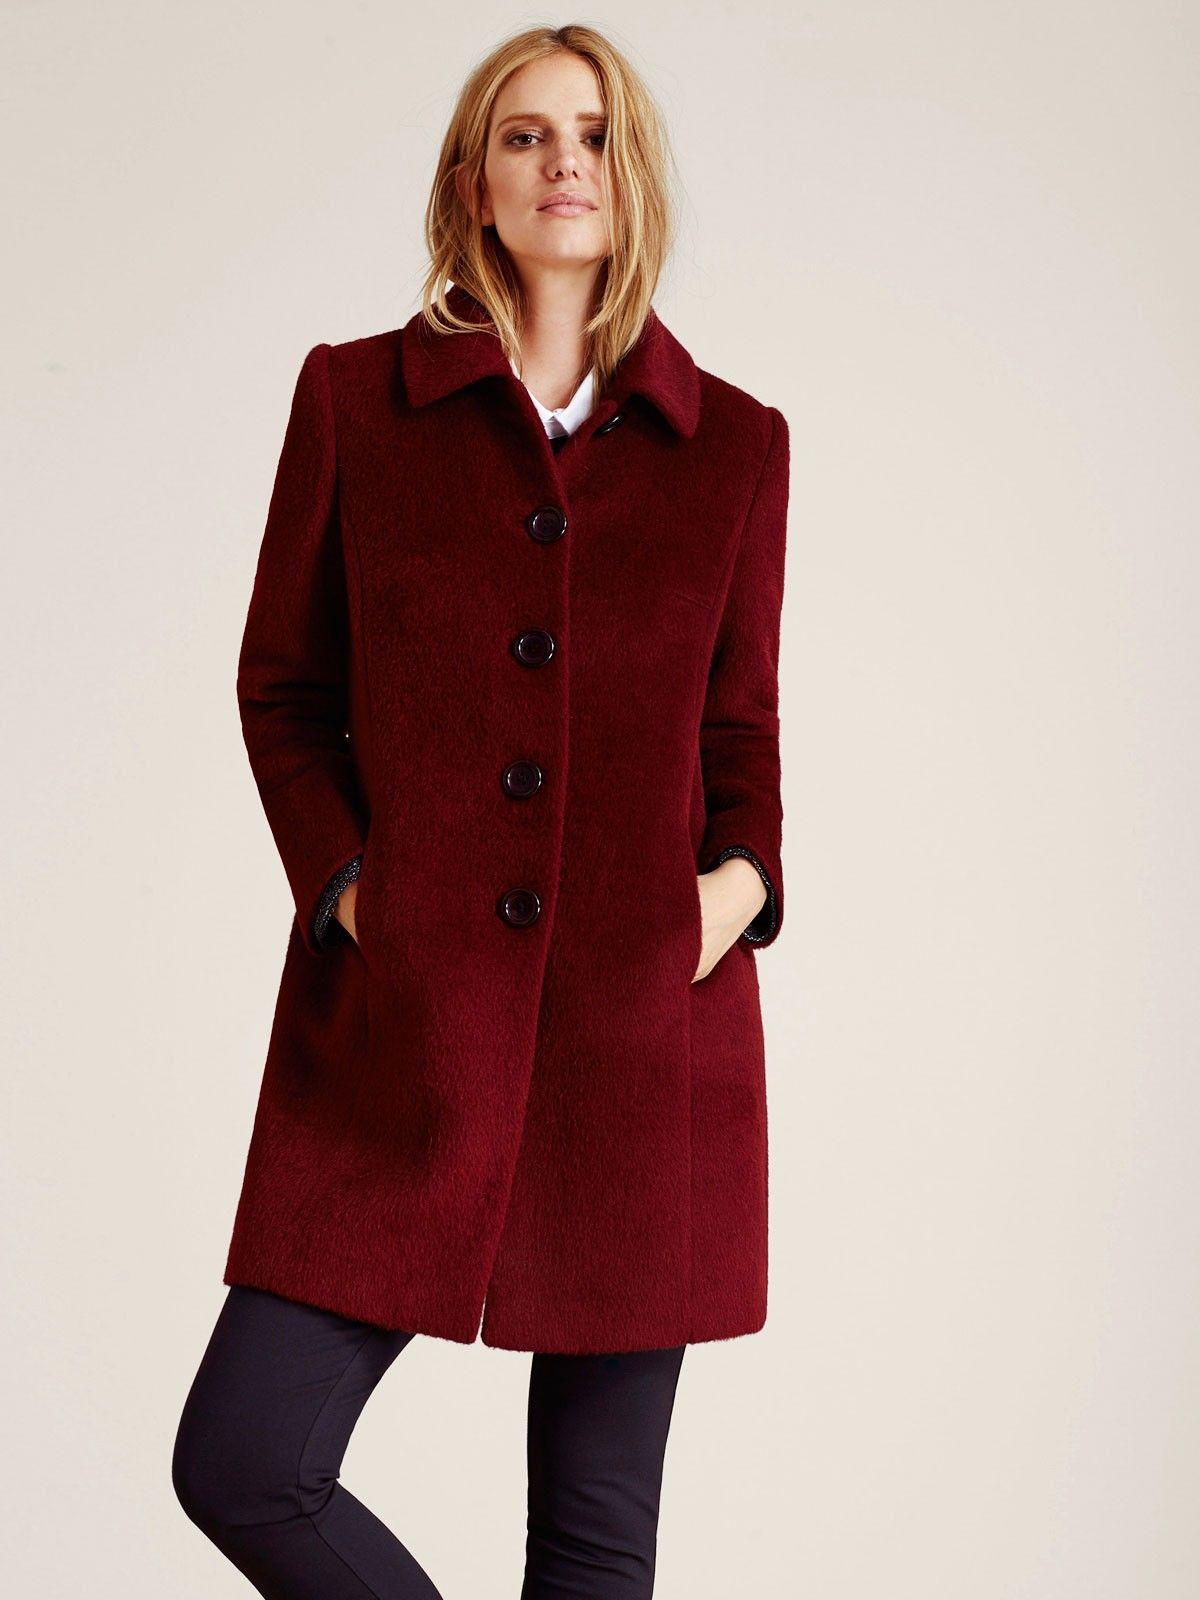 4ddf3b76d22 Abrigo alpaca rojo quemado-1 coleccion javier simorra | Vestidos ...